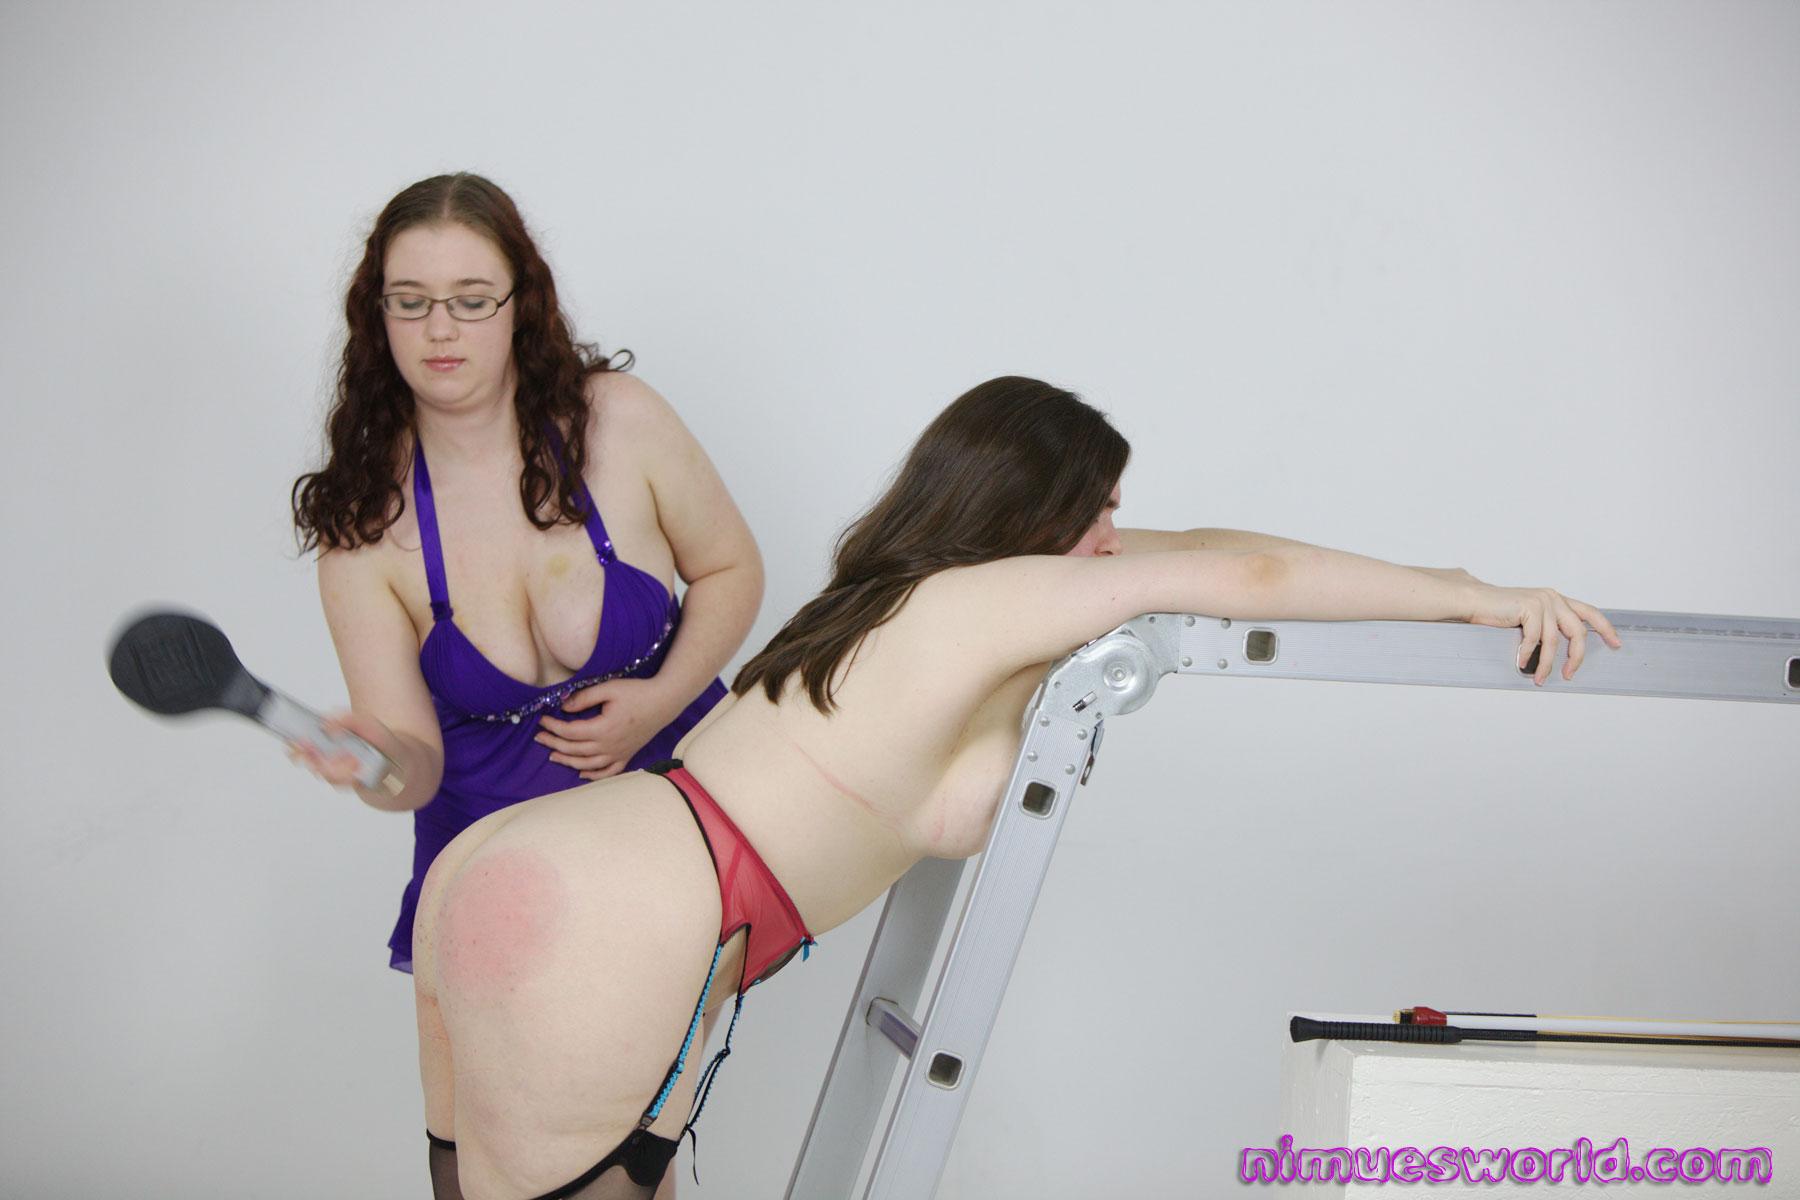 Teacher spanking my girlfriend - amateur lesbian spanking iceland